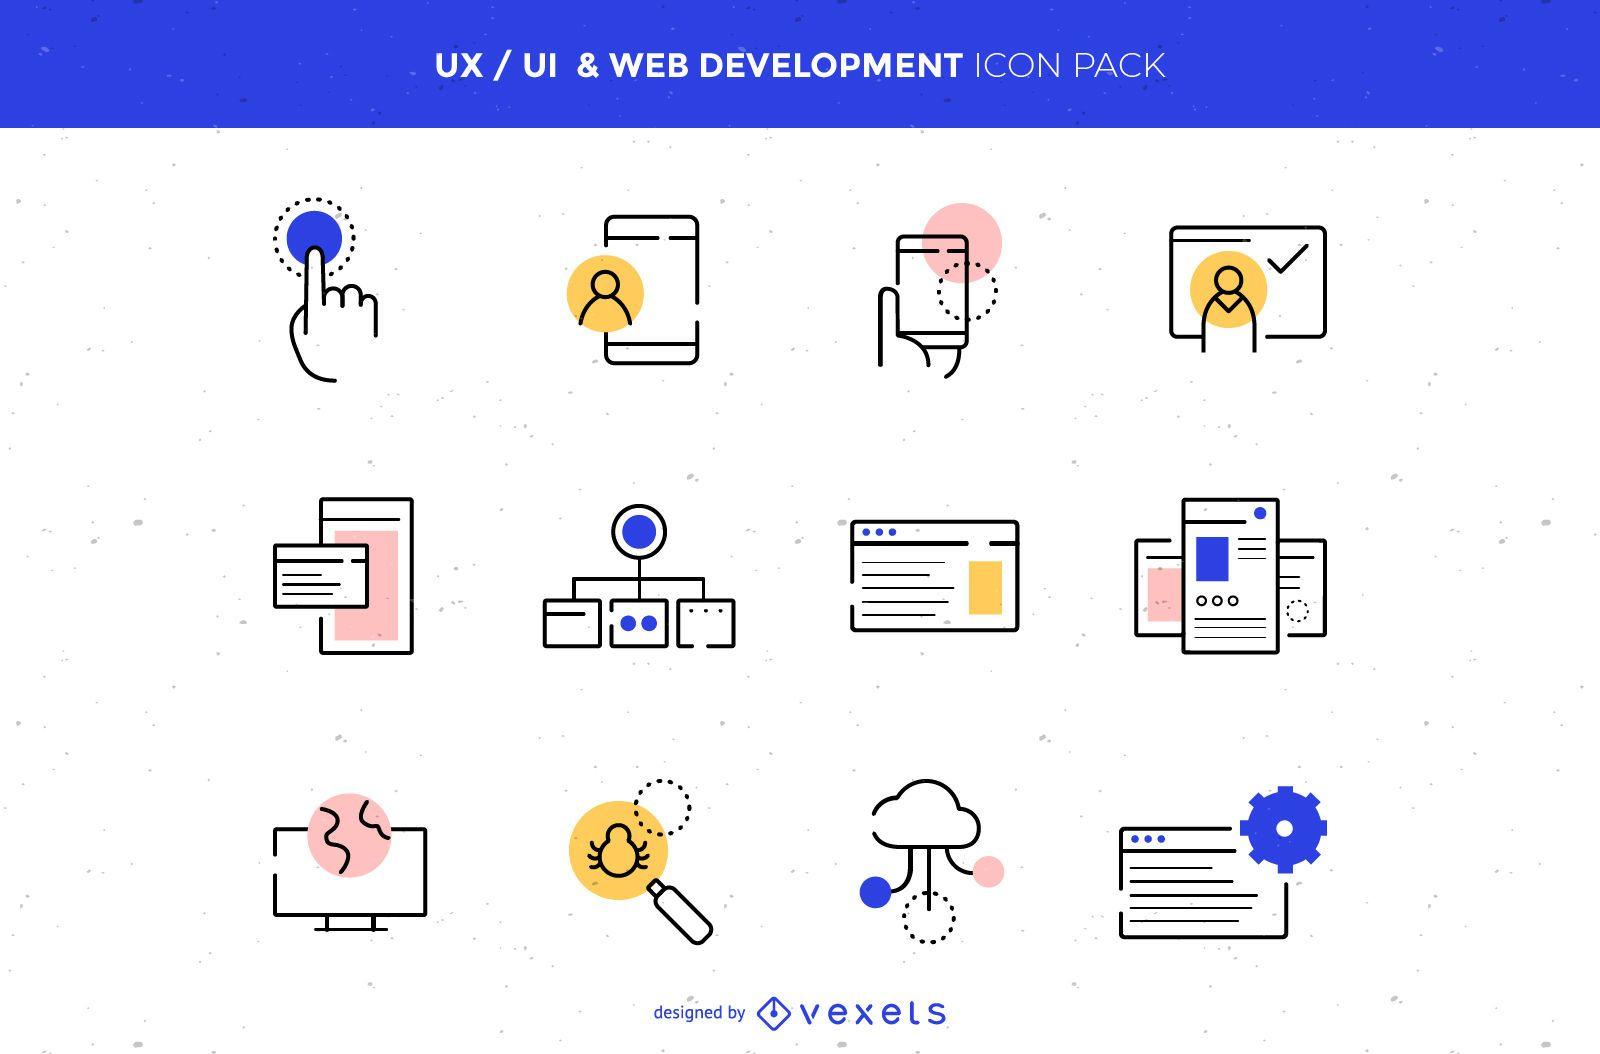 UX/UI & Web Development Icon Pack